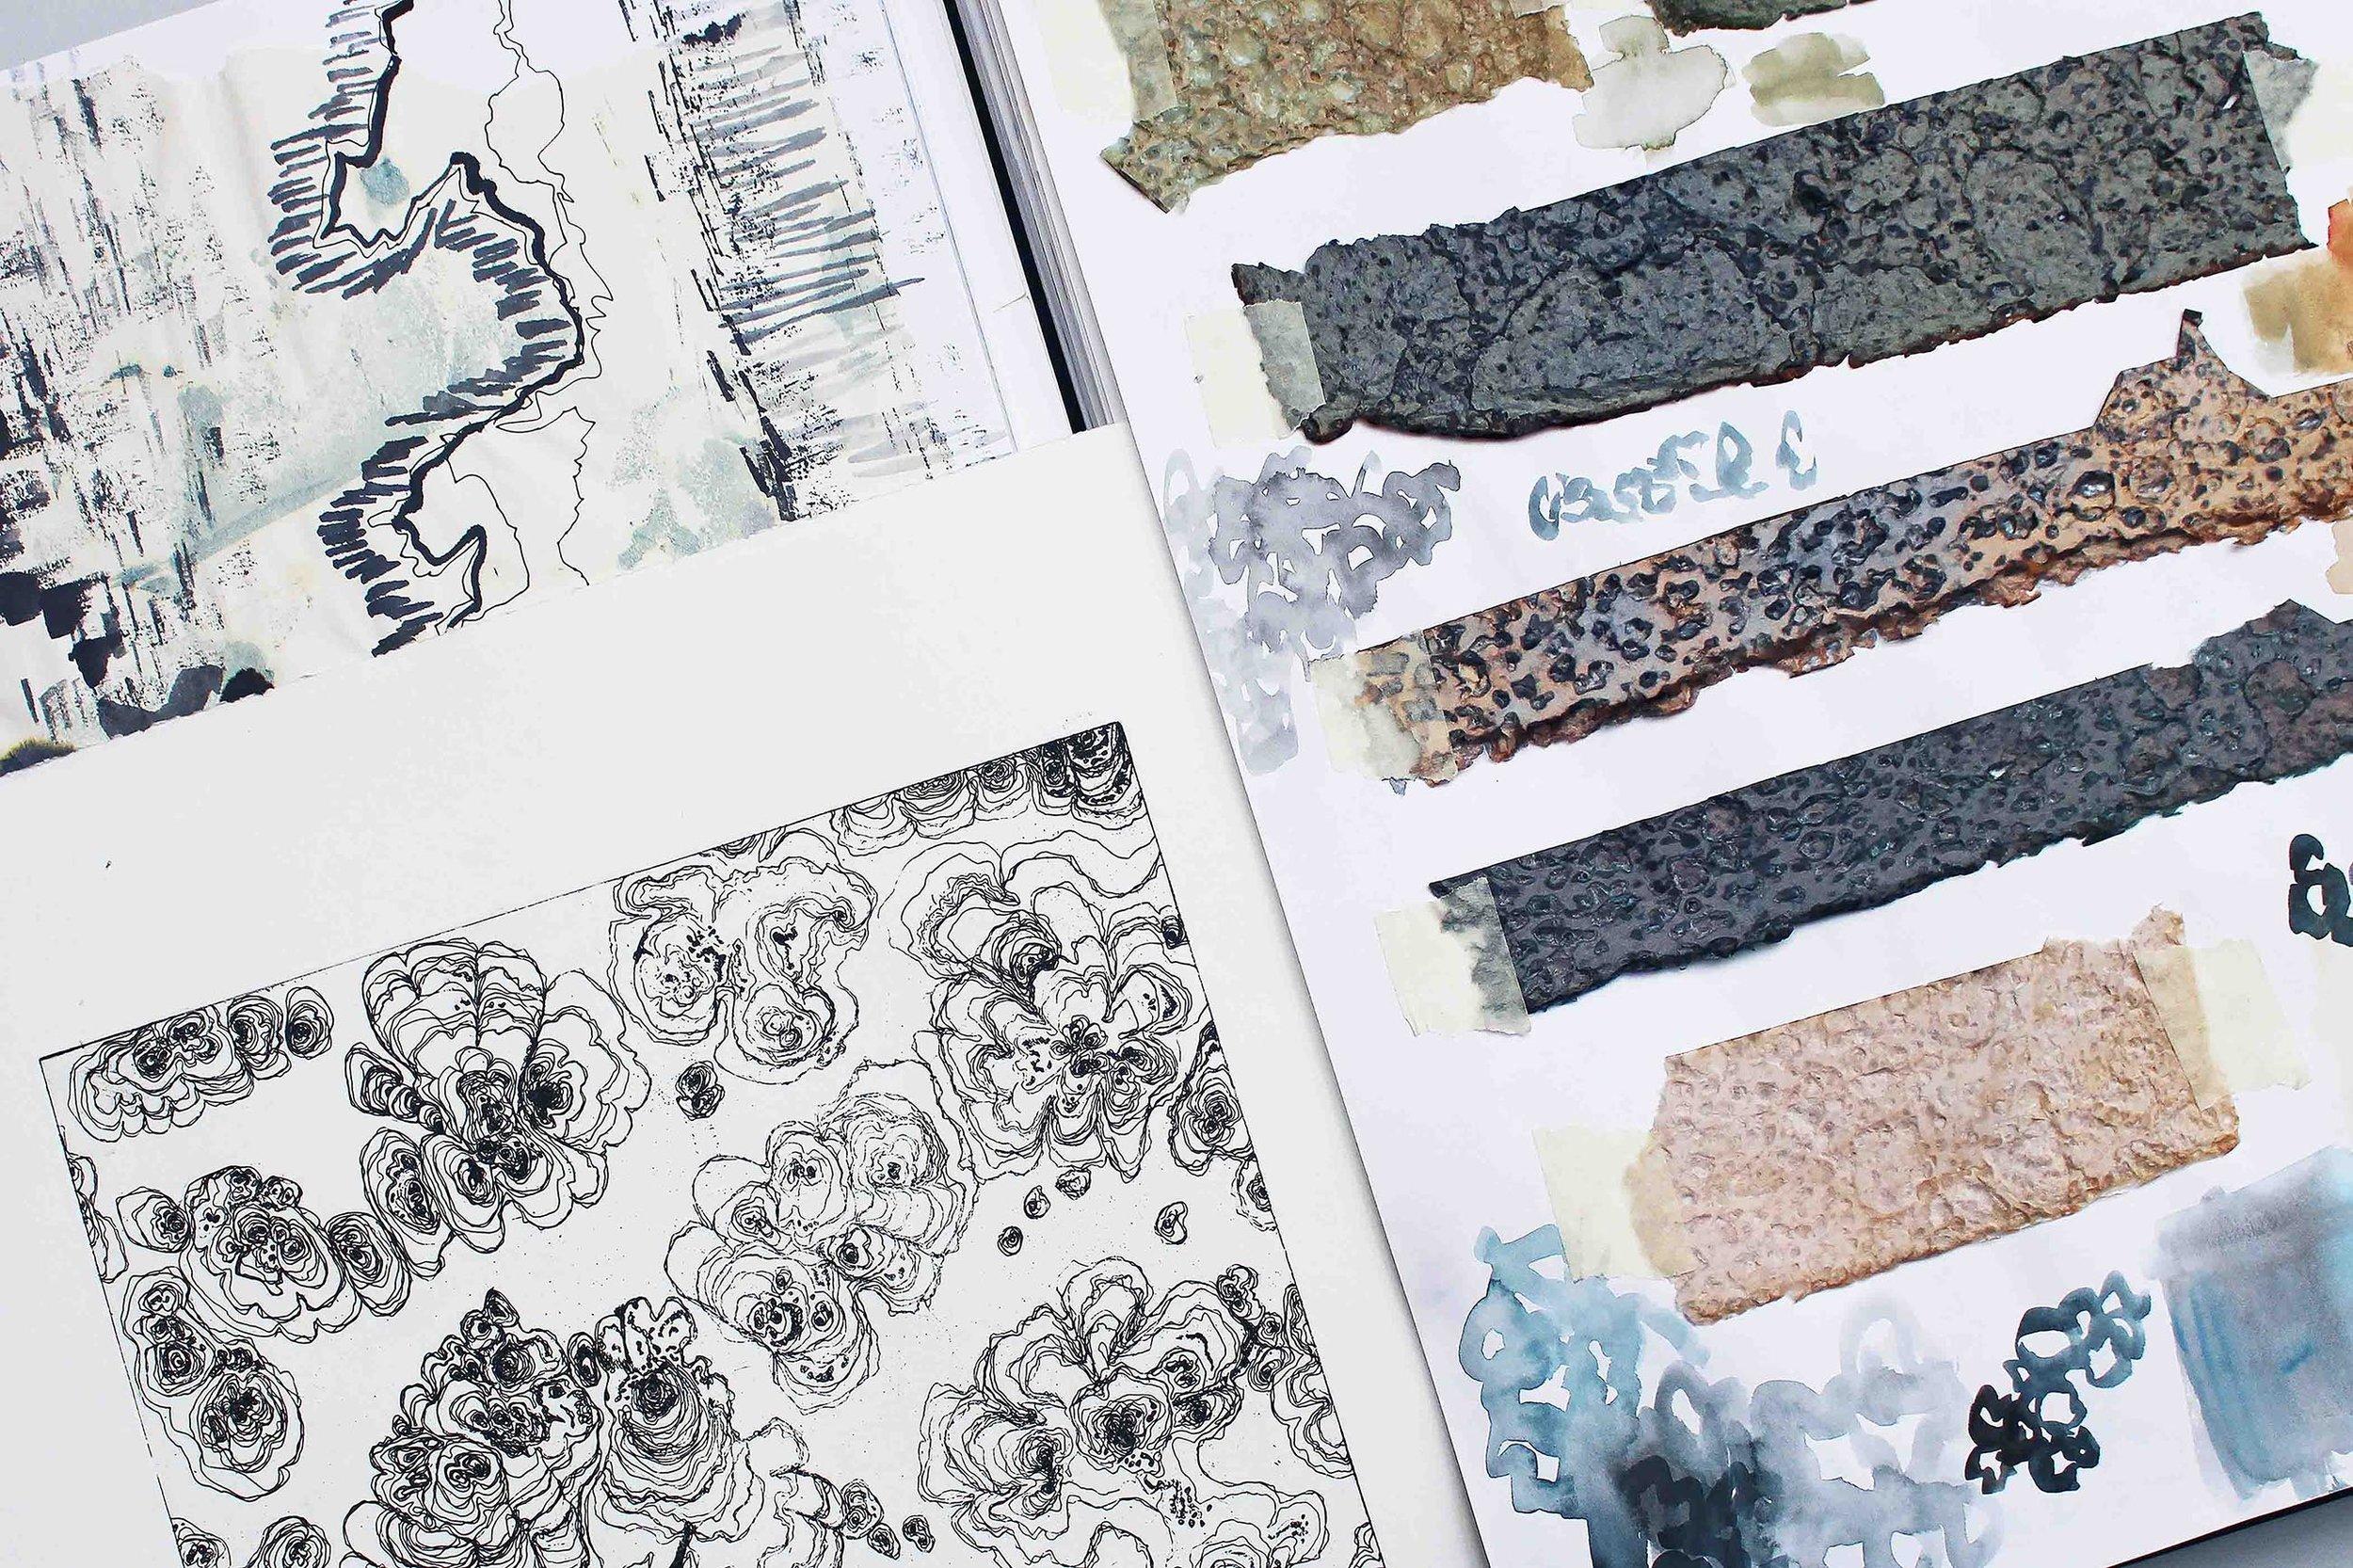 BioMarble color and material testing, Hannah Elisabeth Jones